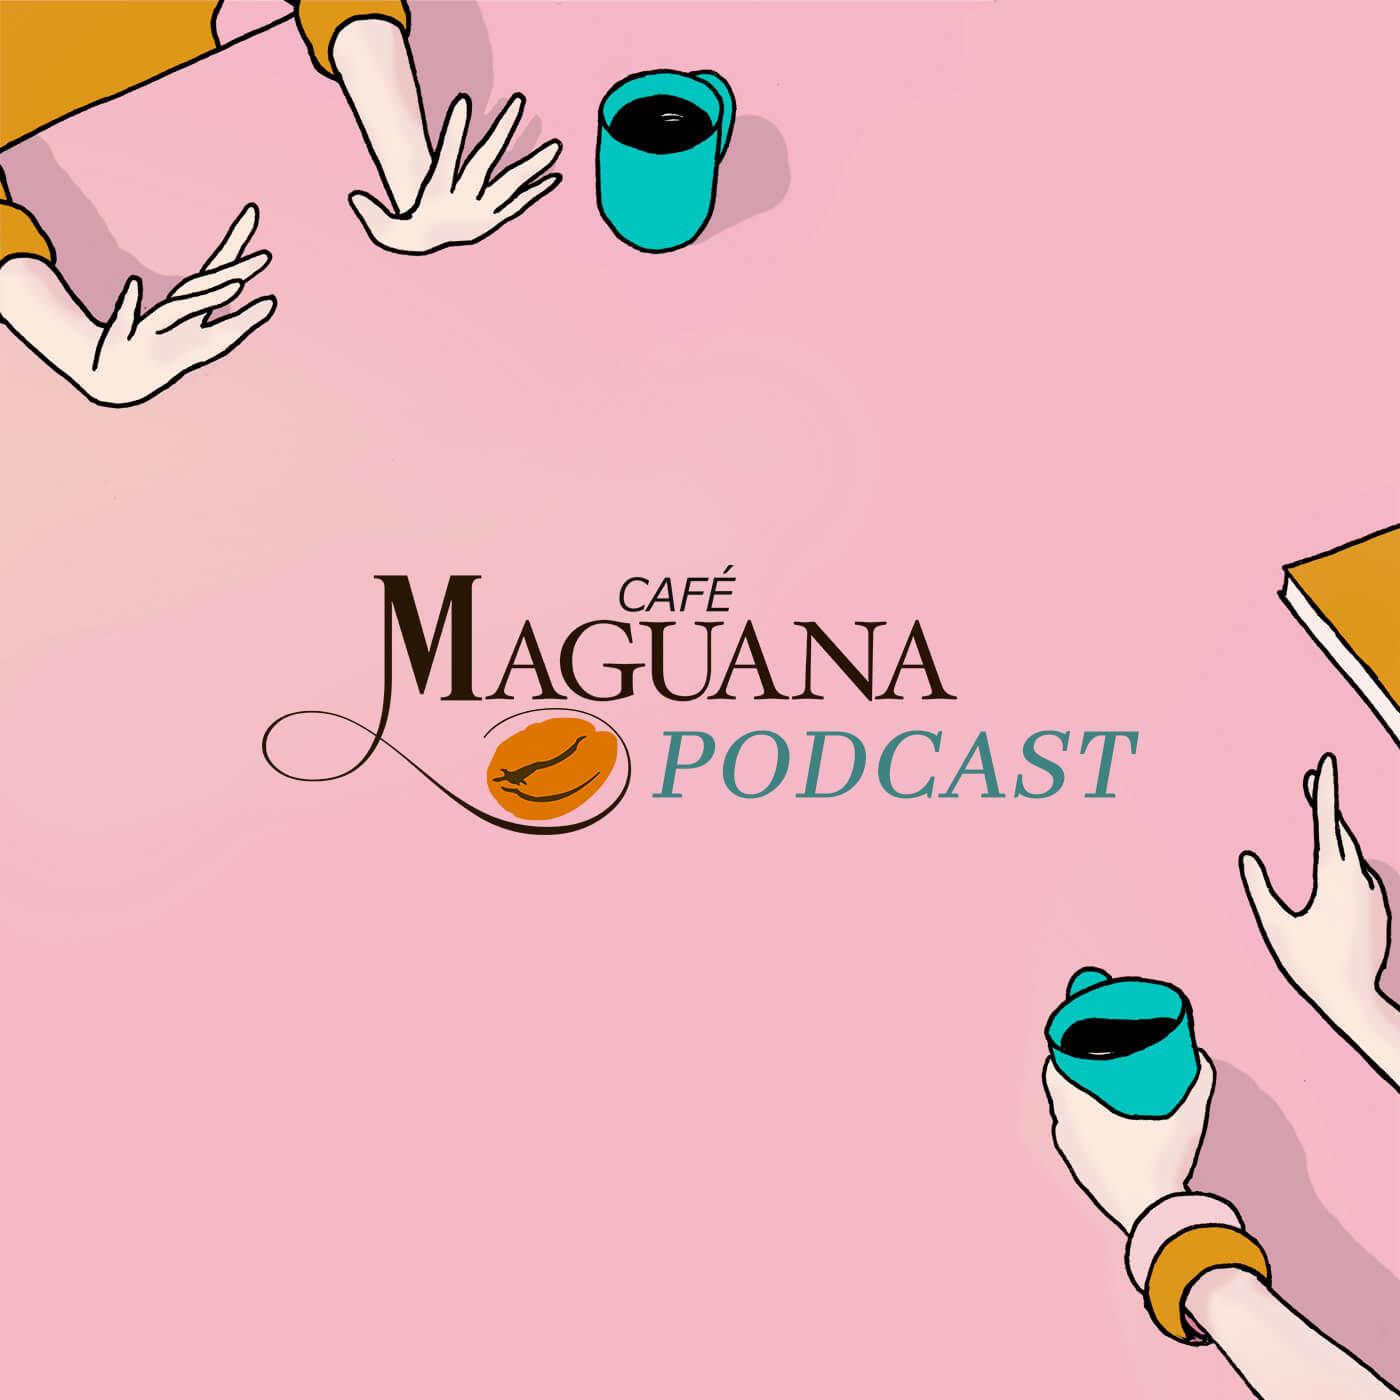 Café Maguana